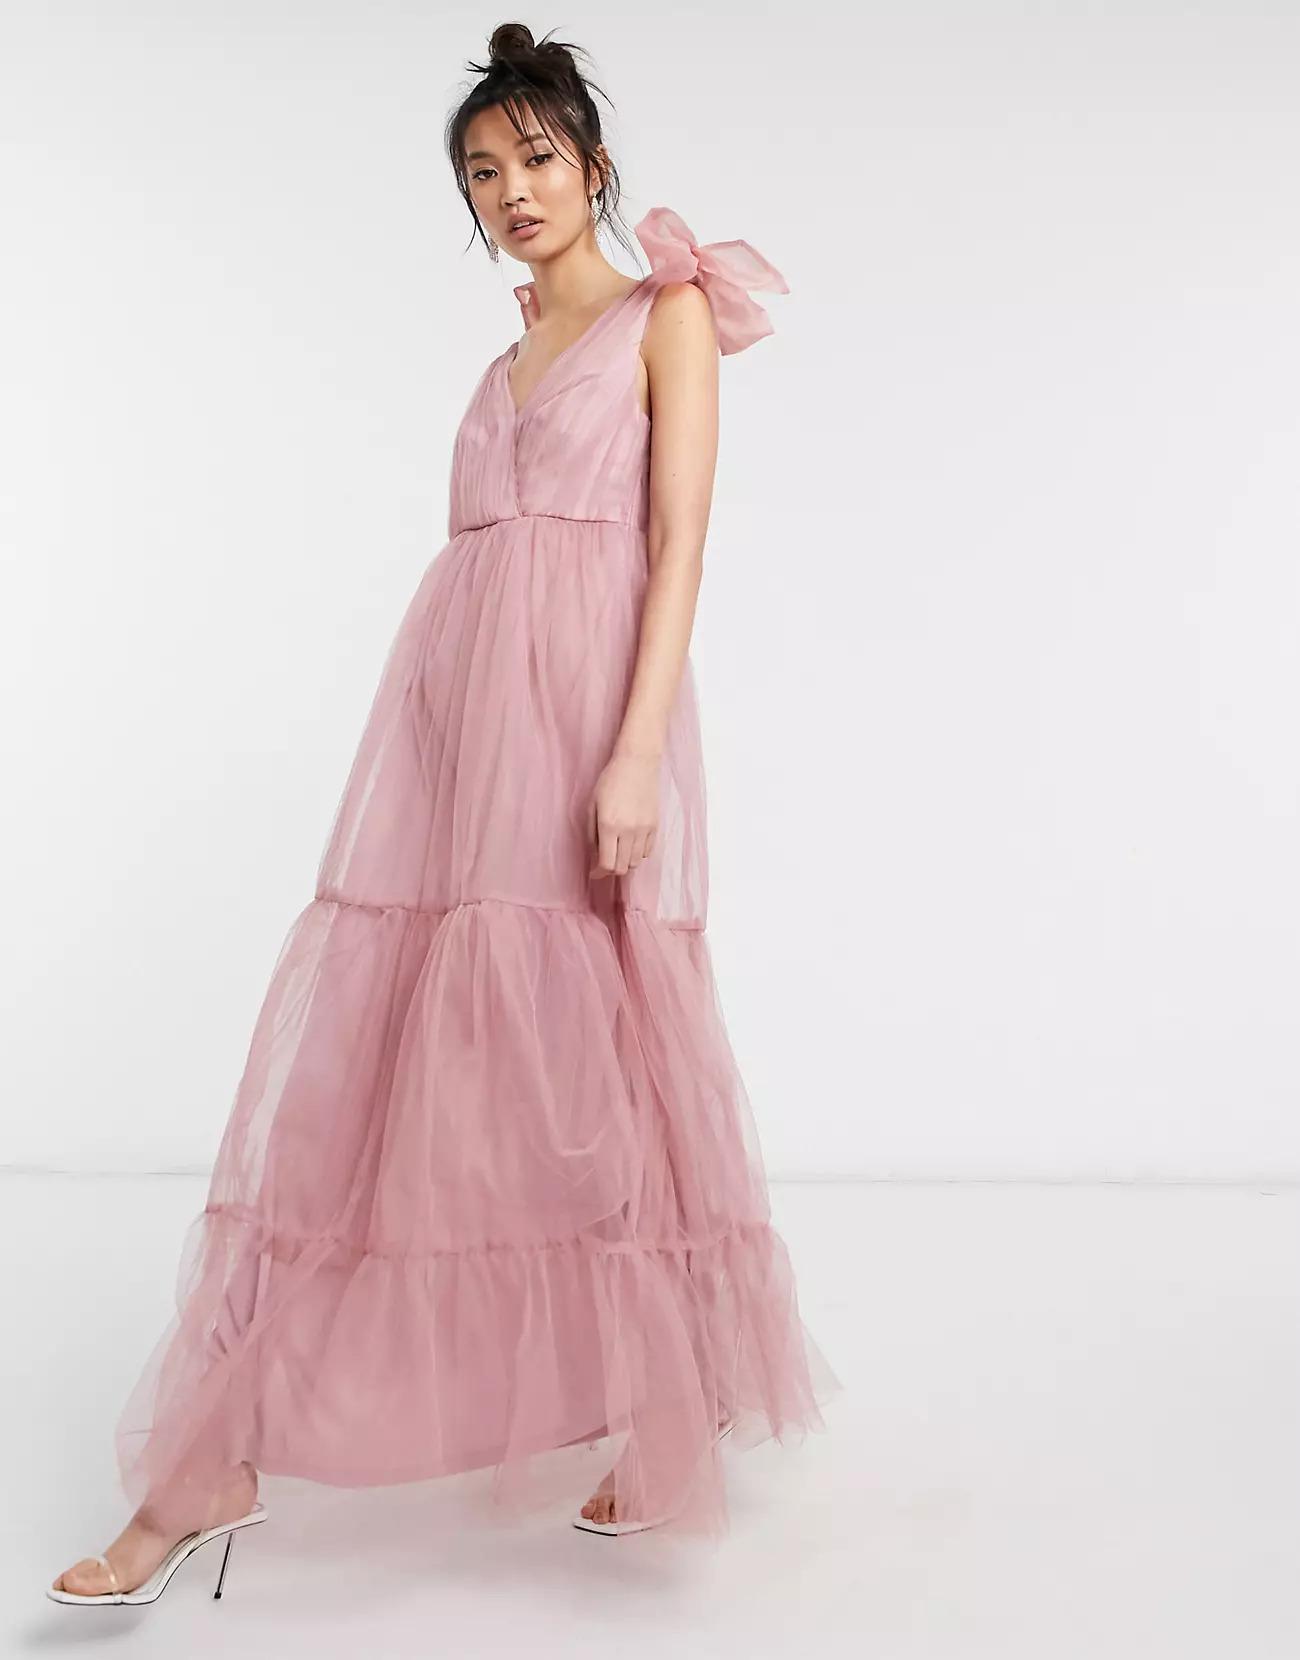 blush tulle bridesmaid dress